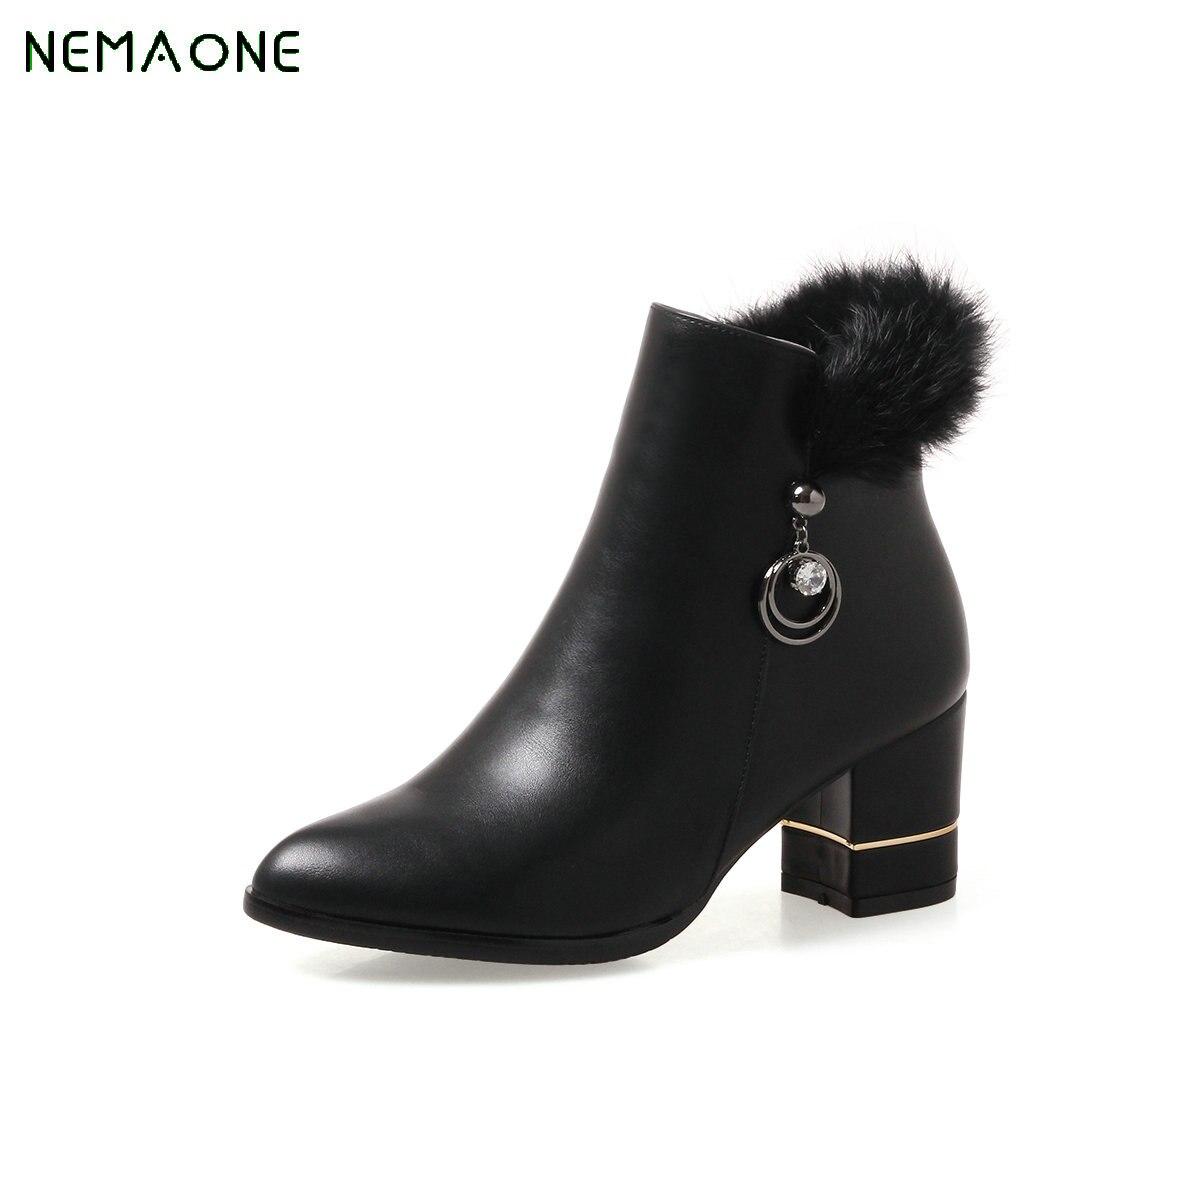 NEMAONE Botas Women Footwear Pu Leather Round Toe Martin Boots Platform Shoes Female Autumn/winter High Heel Ankle Boots Zipper<br>